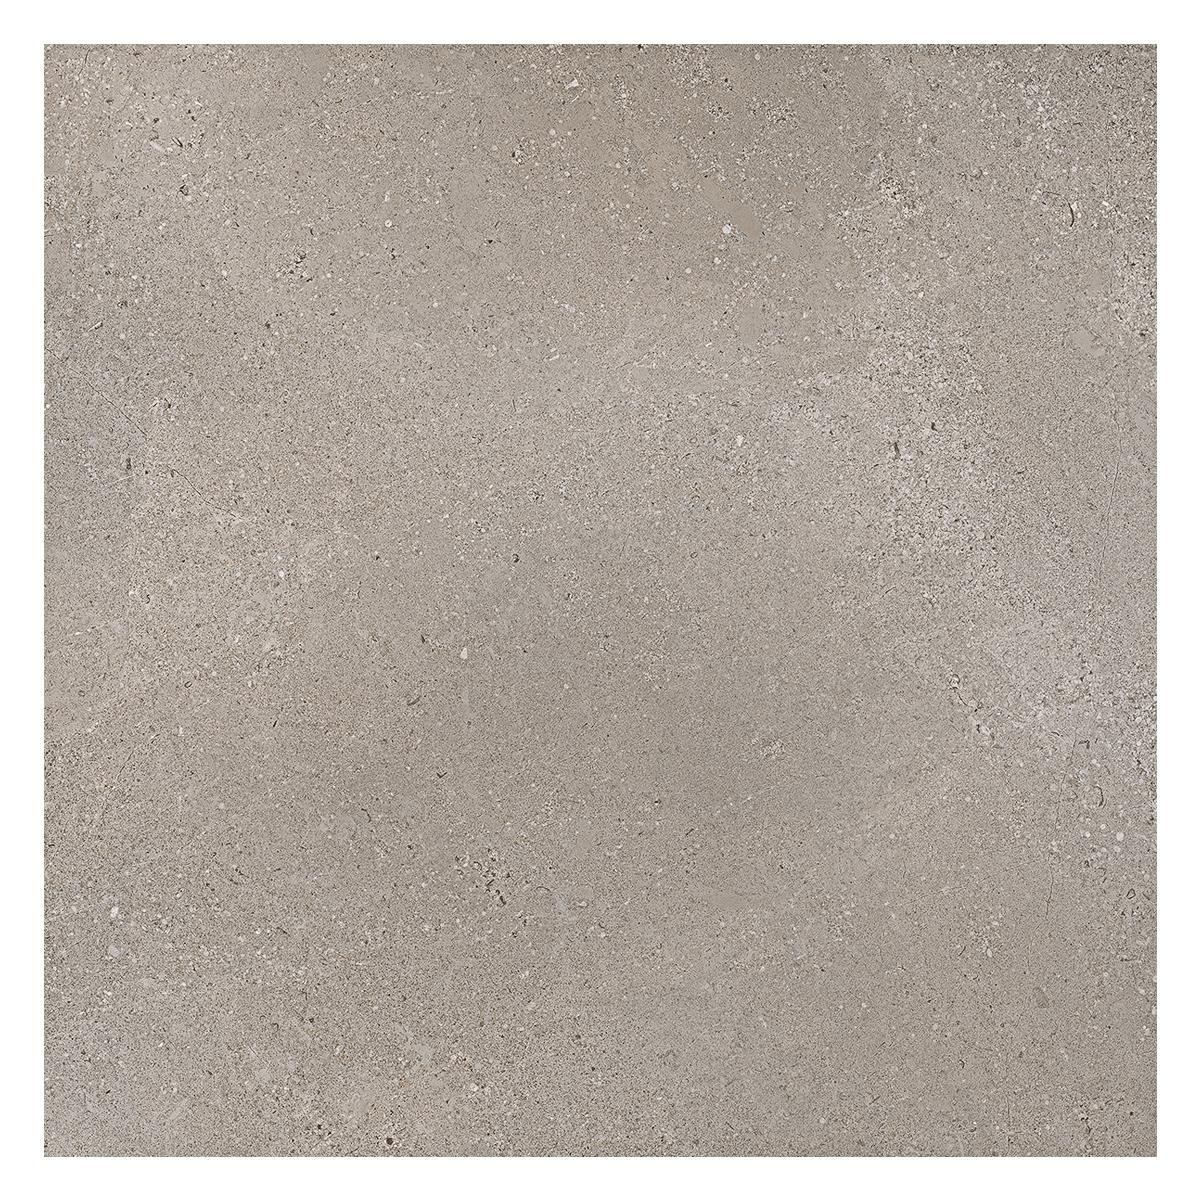 Porcelanato Iconic Gris Oscuro Mate - 58X58 cm - 1.68 m2